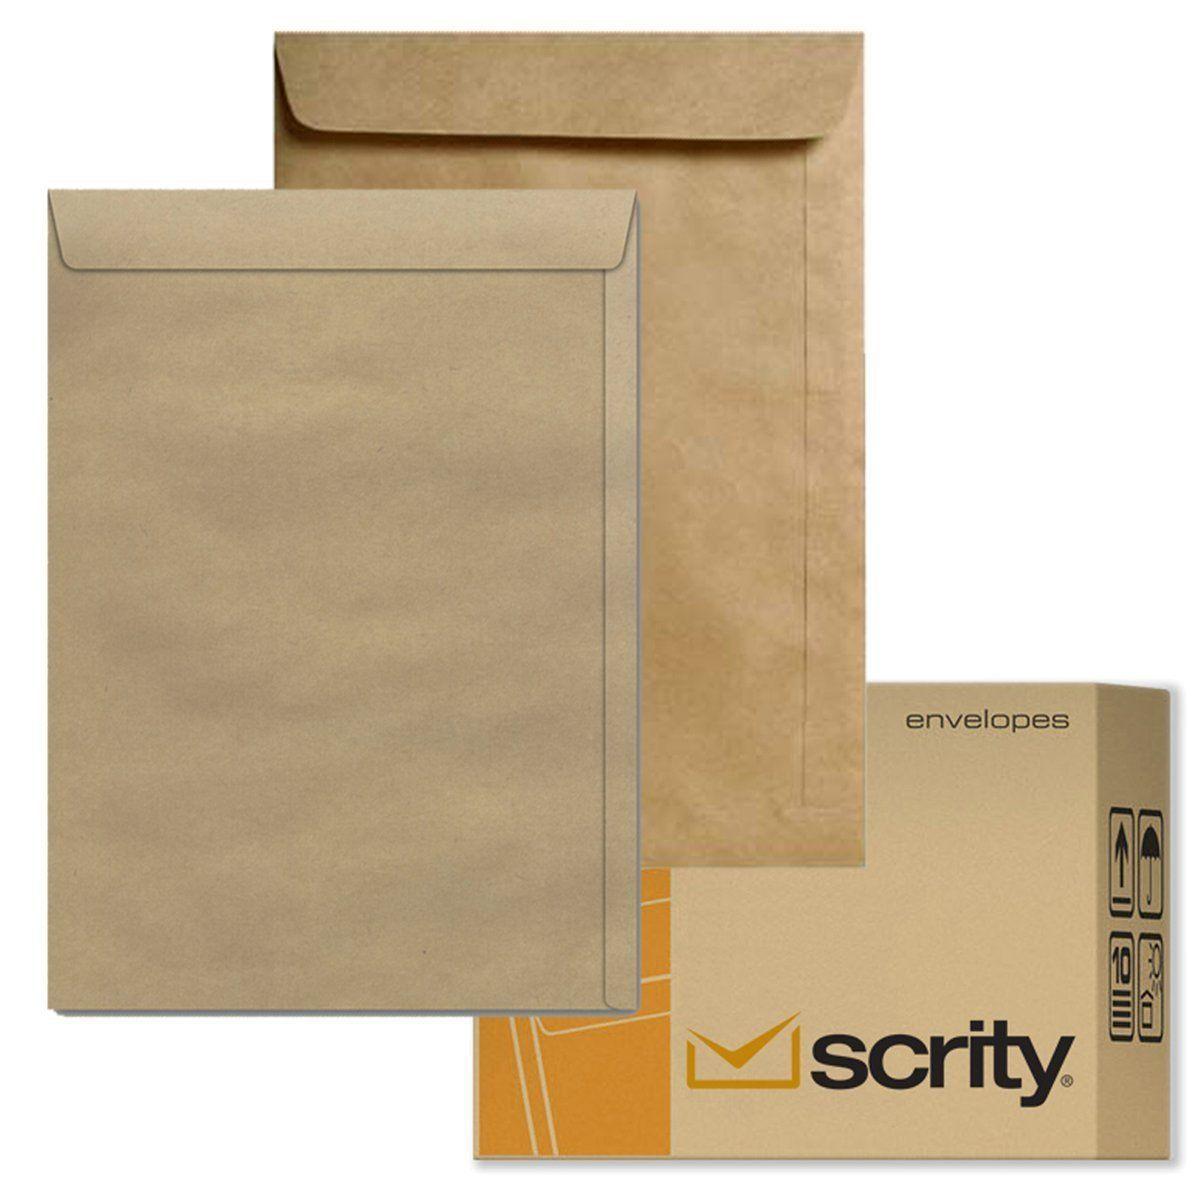 Envelope Scrity Saco Kraft 32 229 X 324 mm 80G 100 UN 07725